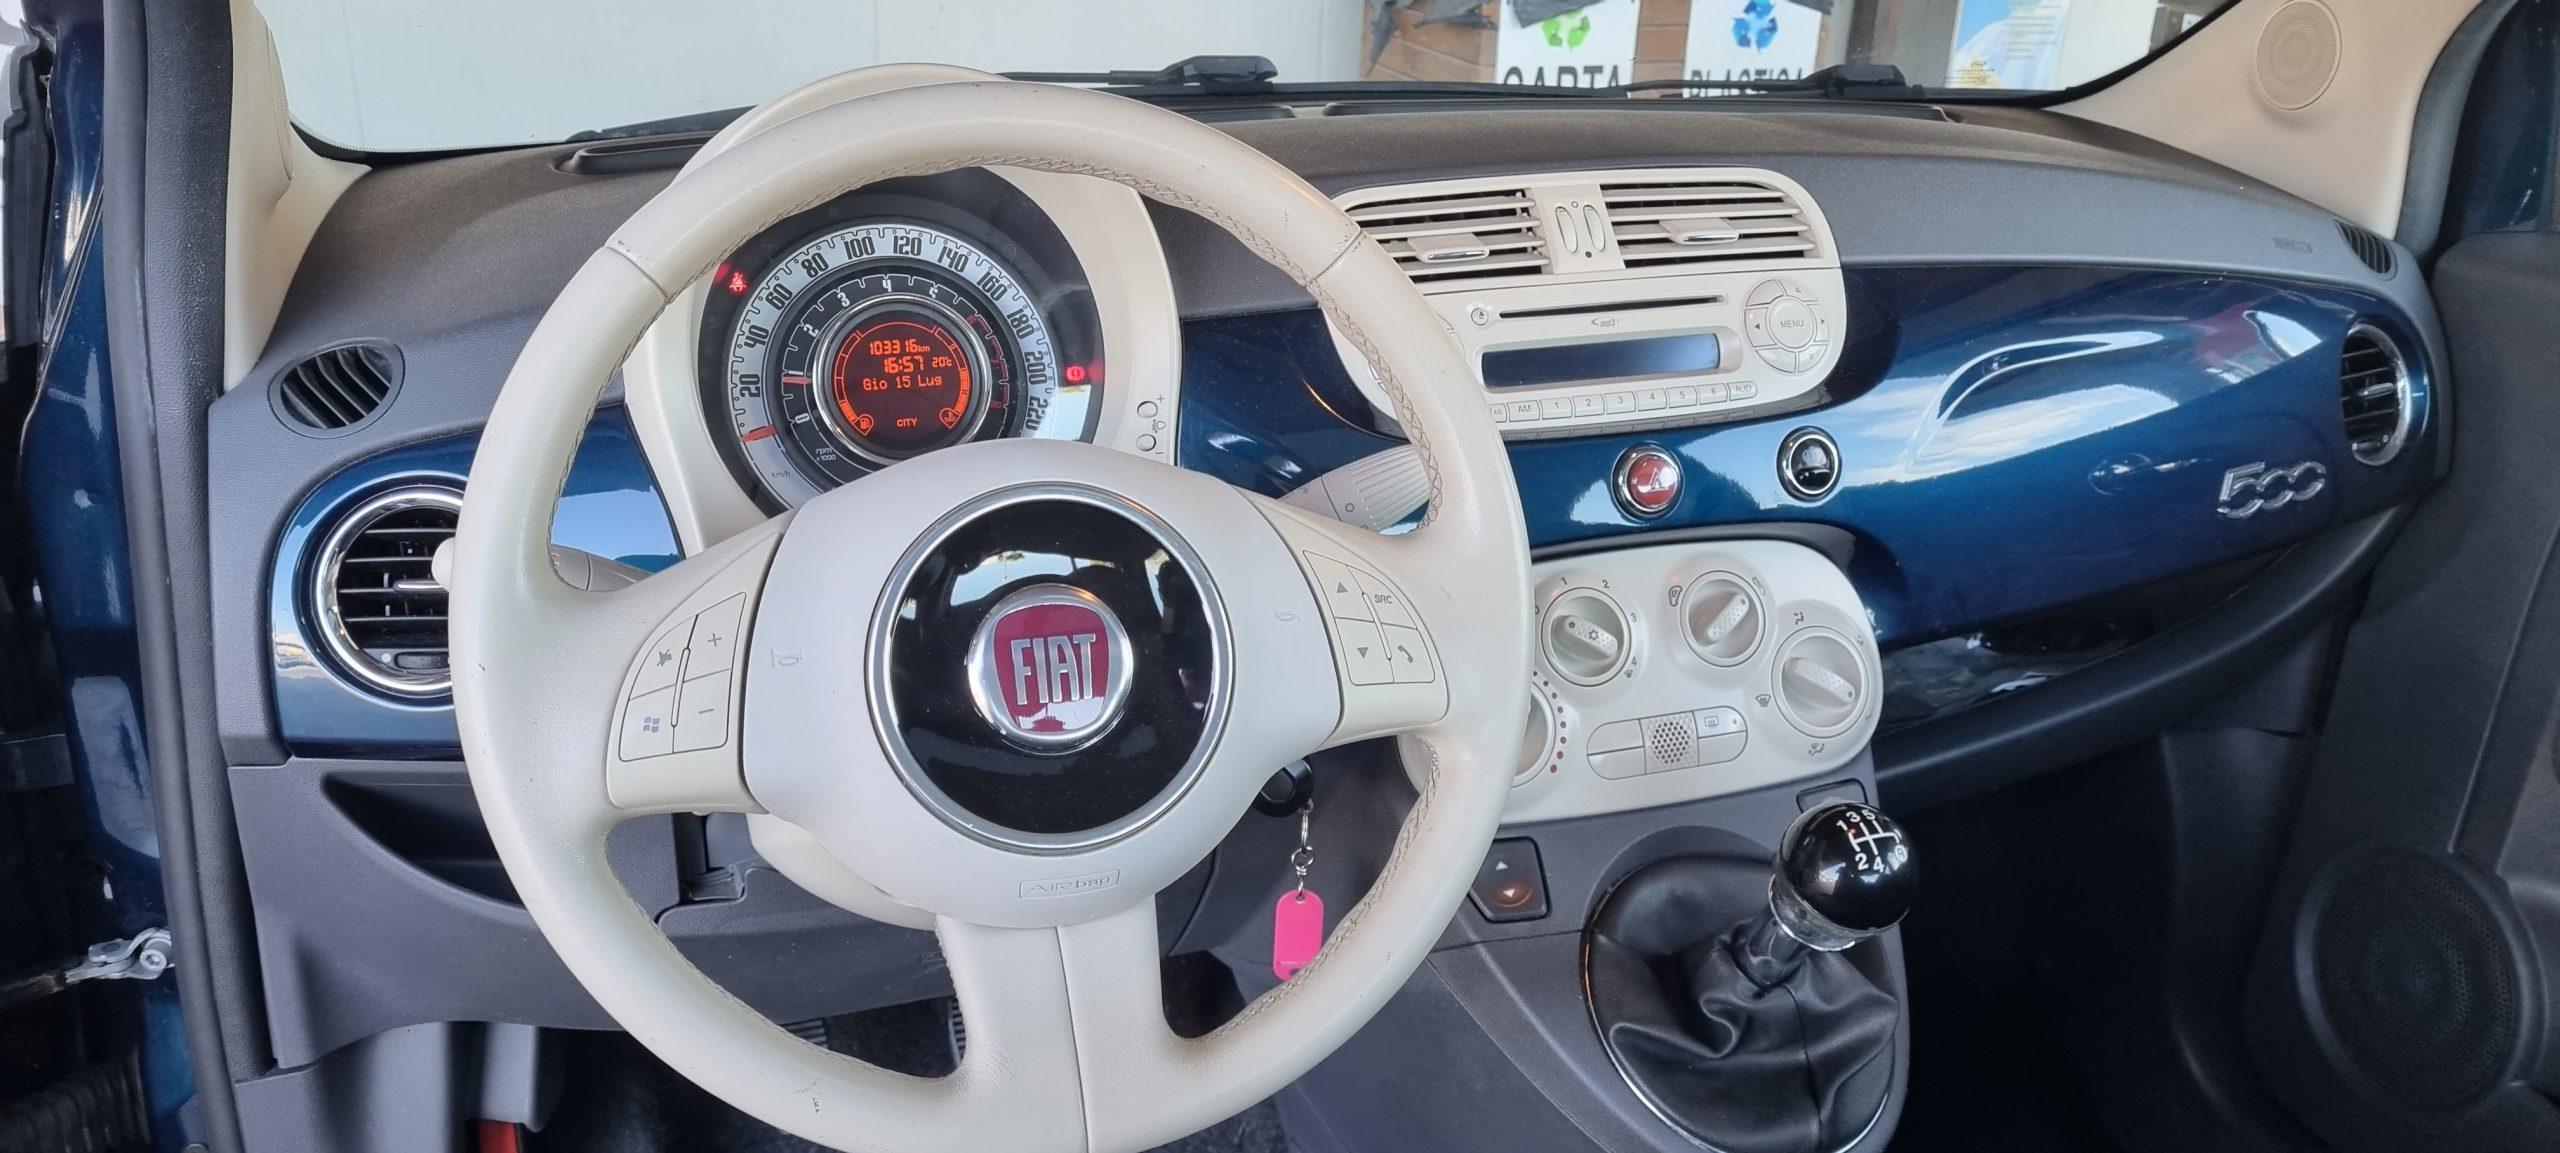 FIAT 500 1.2 EASY POWER Pop